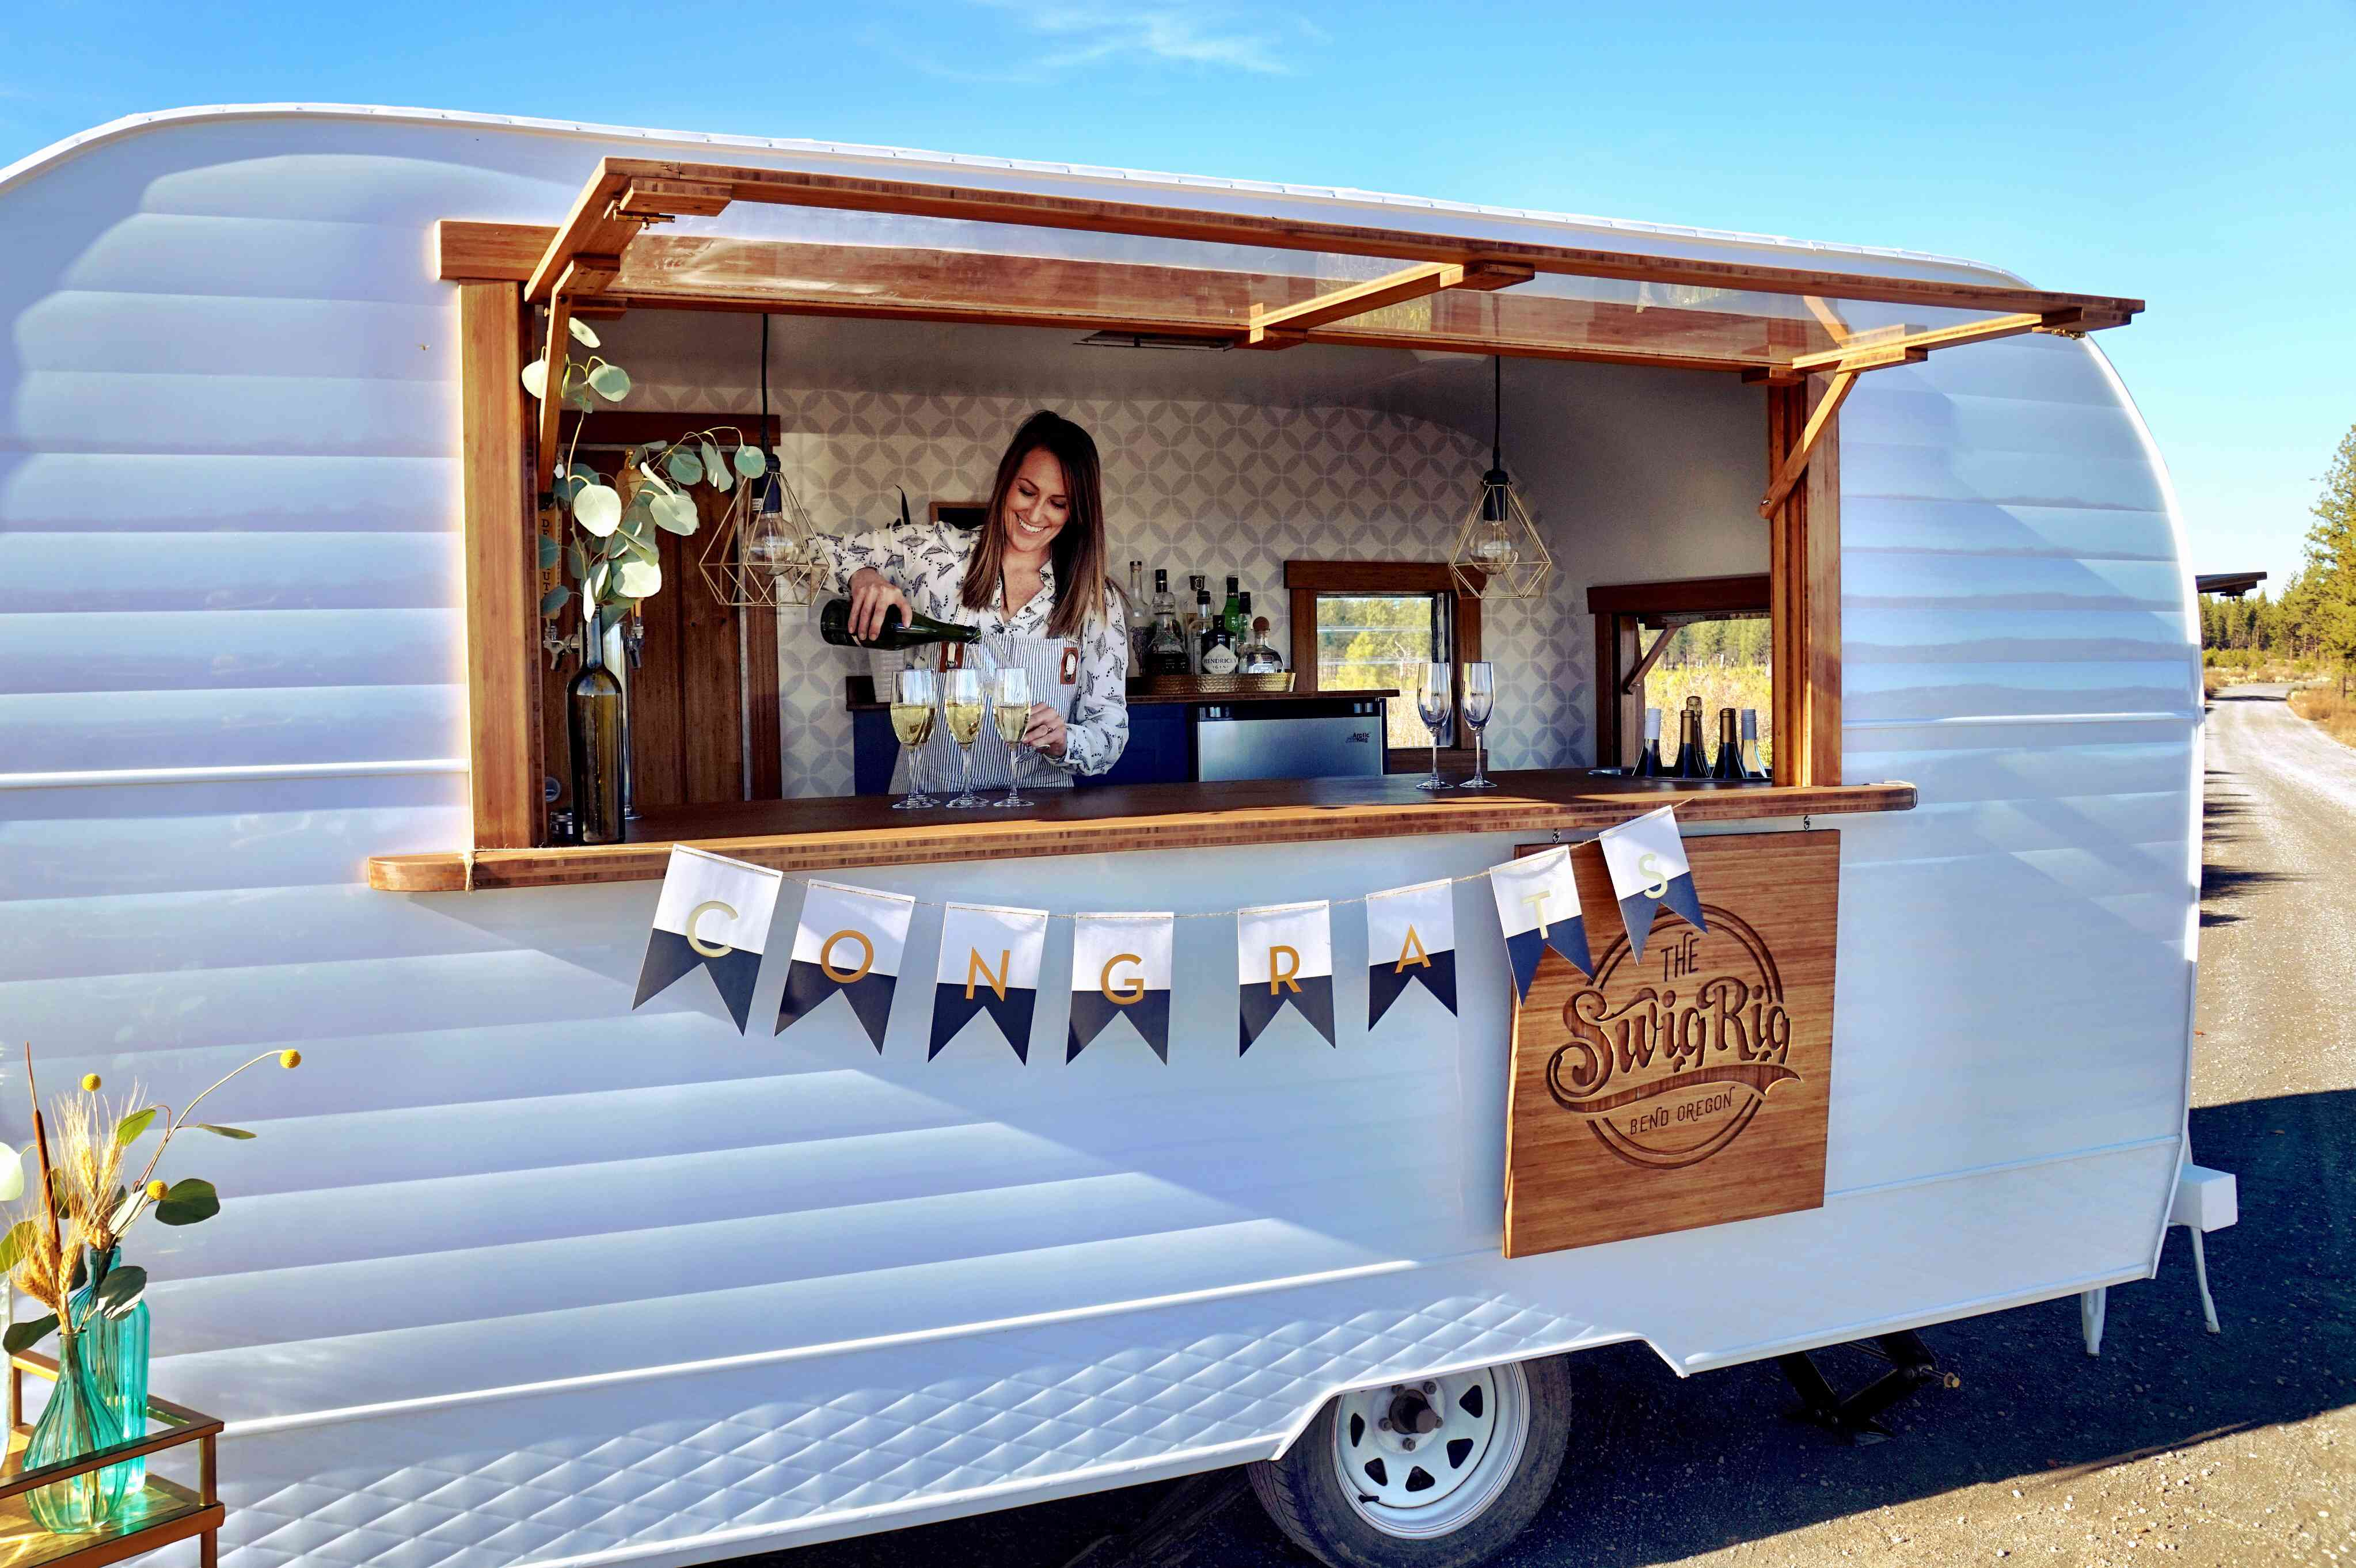 Mobile bar at a wedding reception congratulation (graduation party)